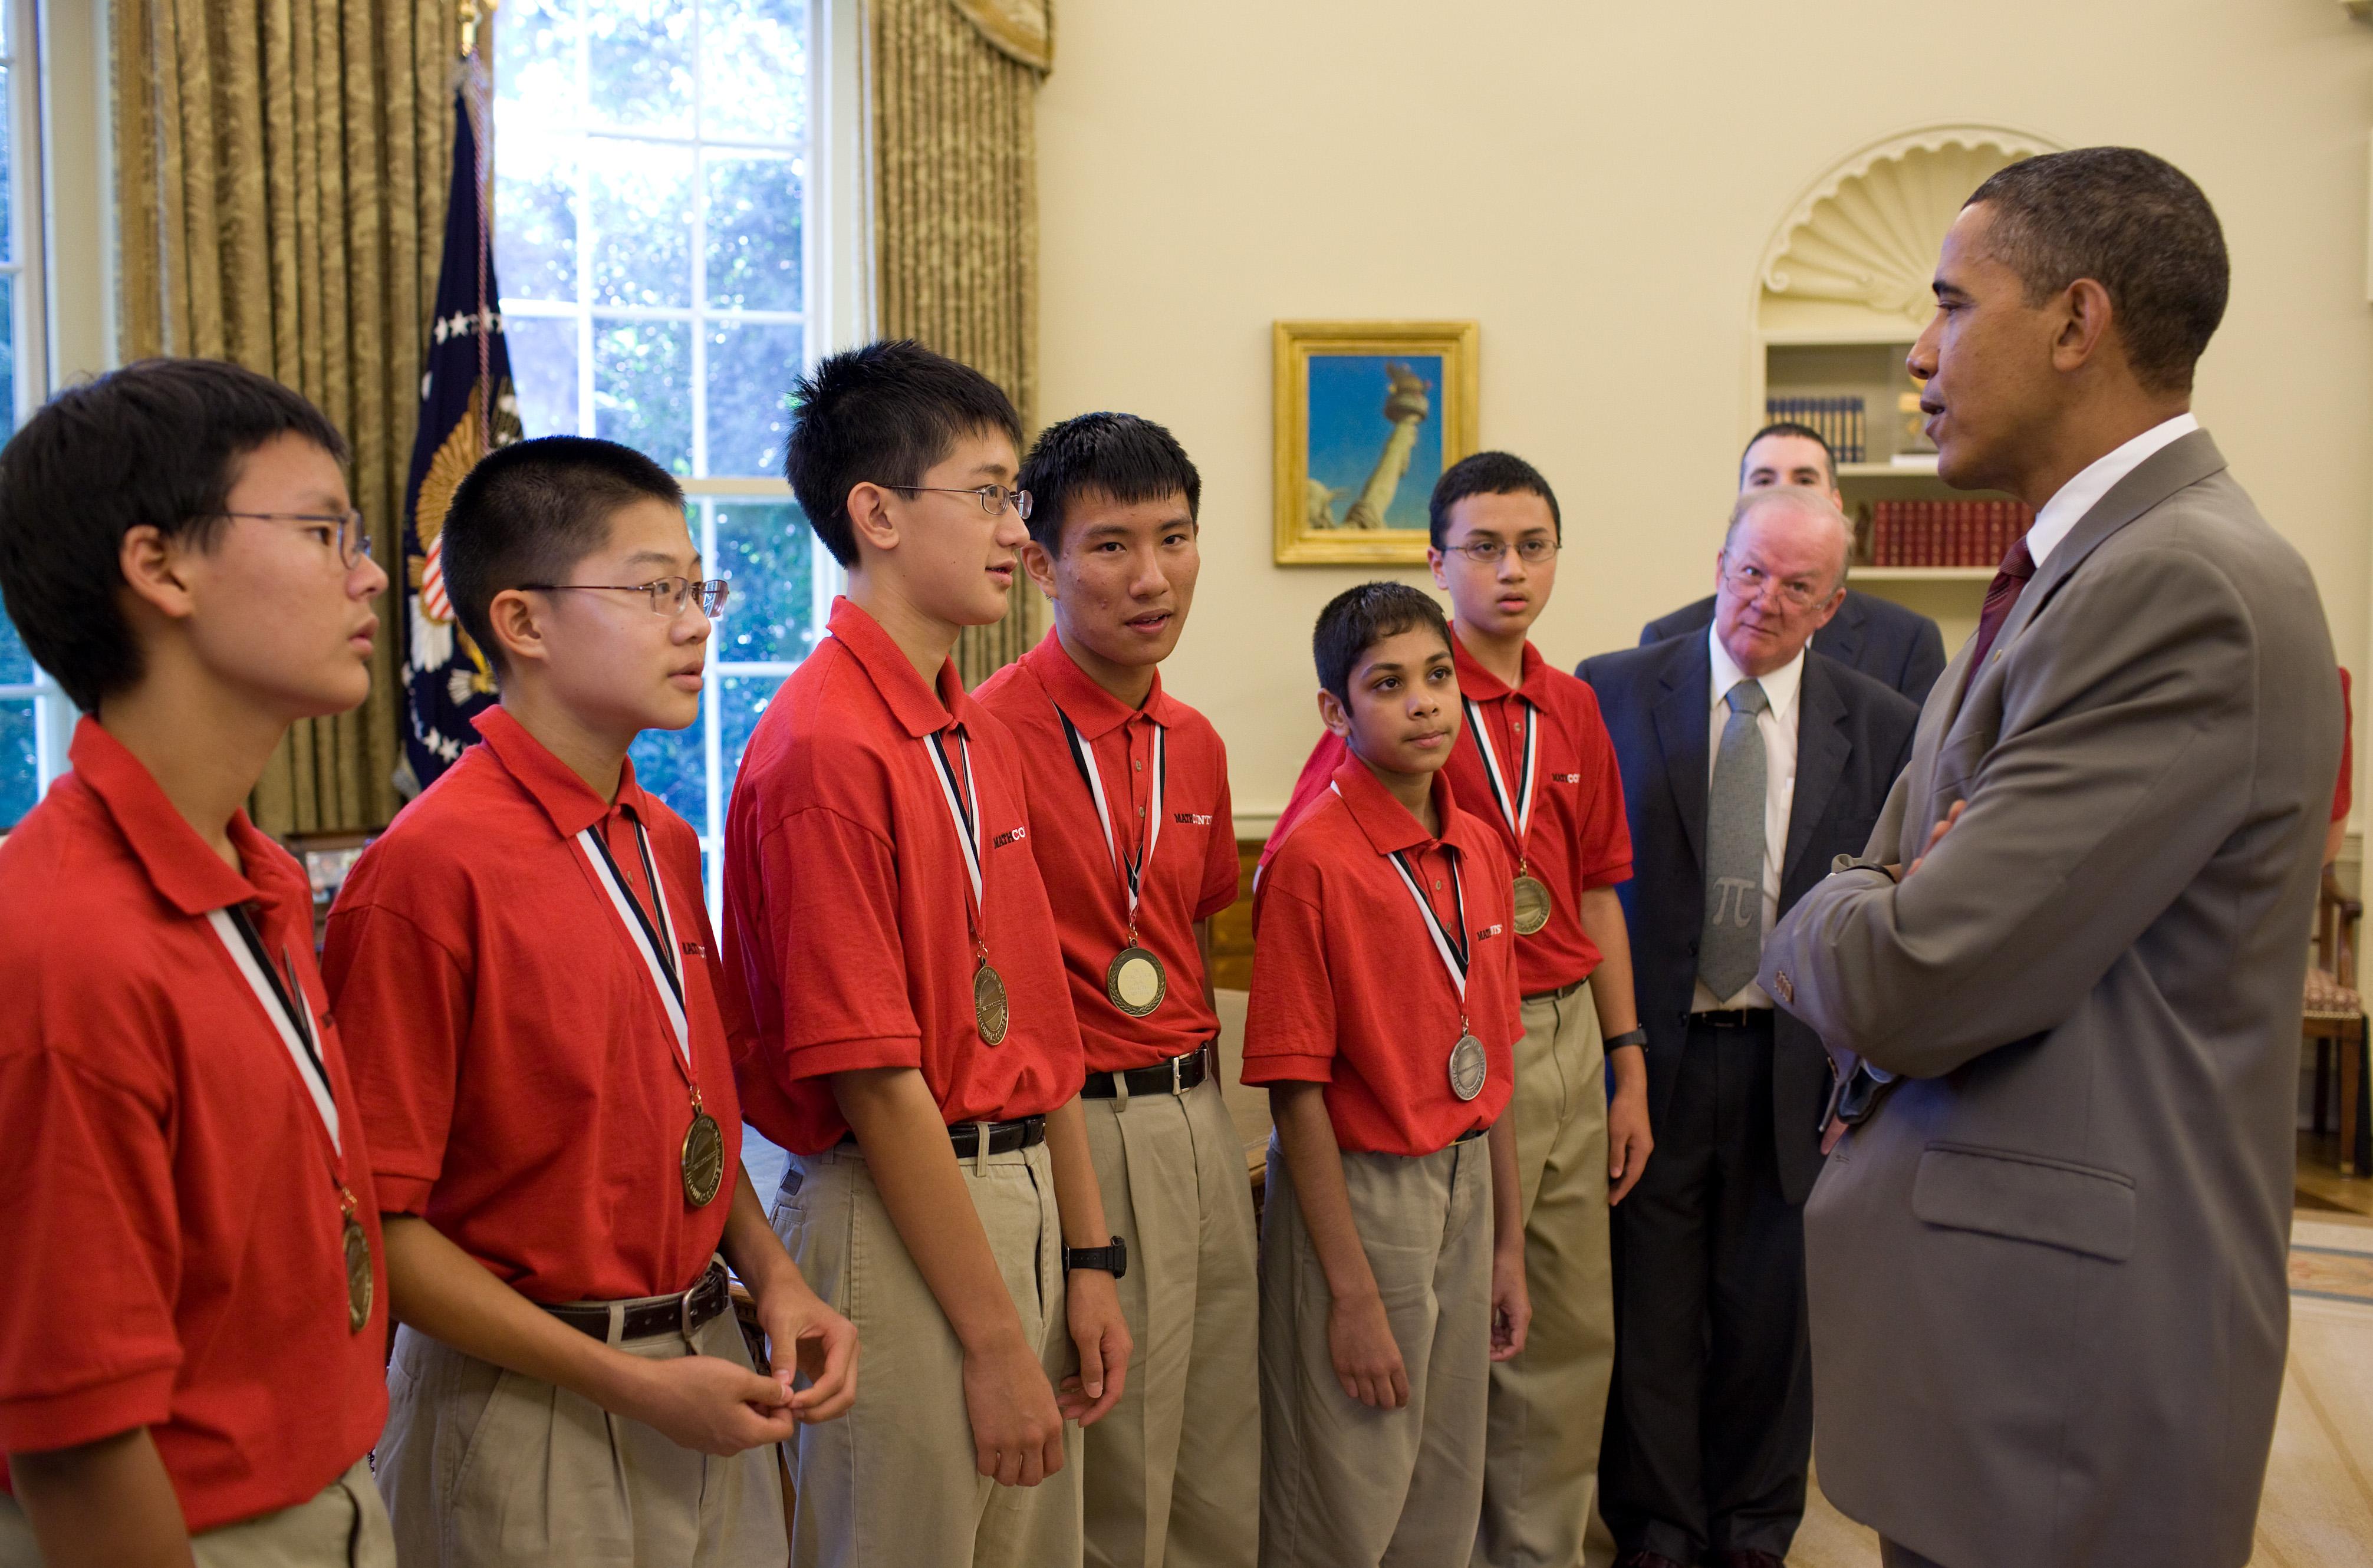 Mathcounts Winners Visit President Obama